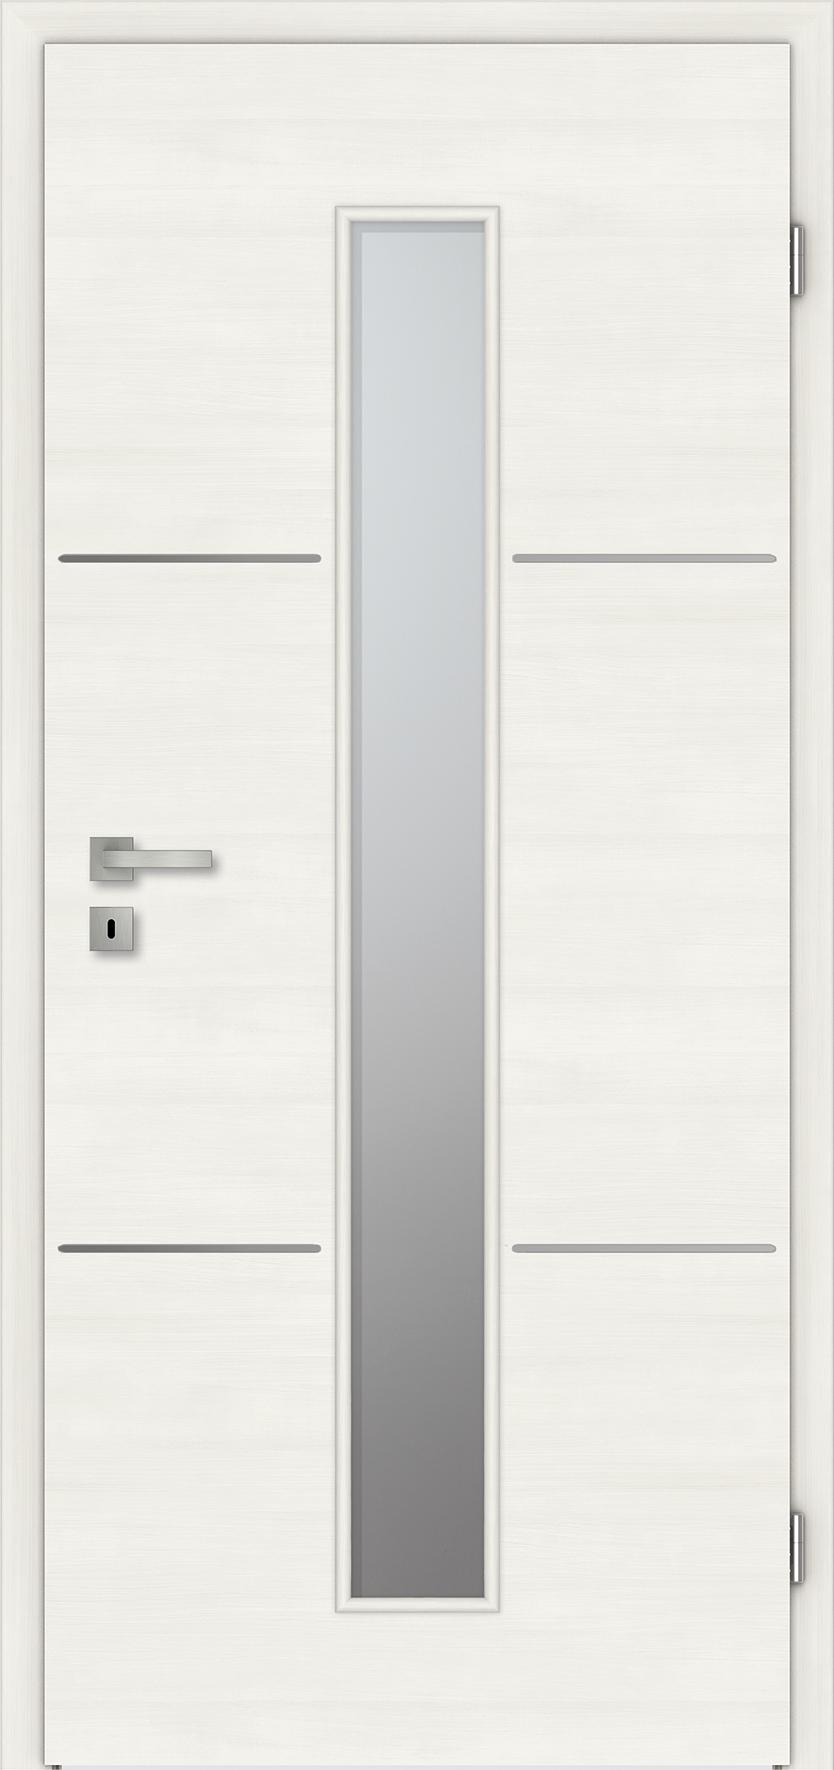 RY-531-LA2-DQ_CPL Touch Whiteline